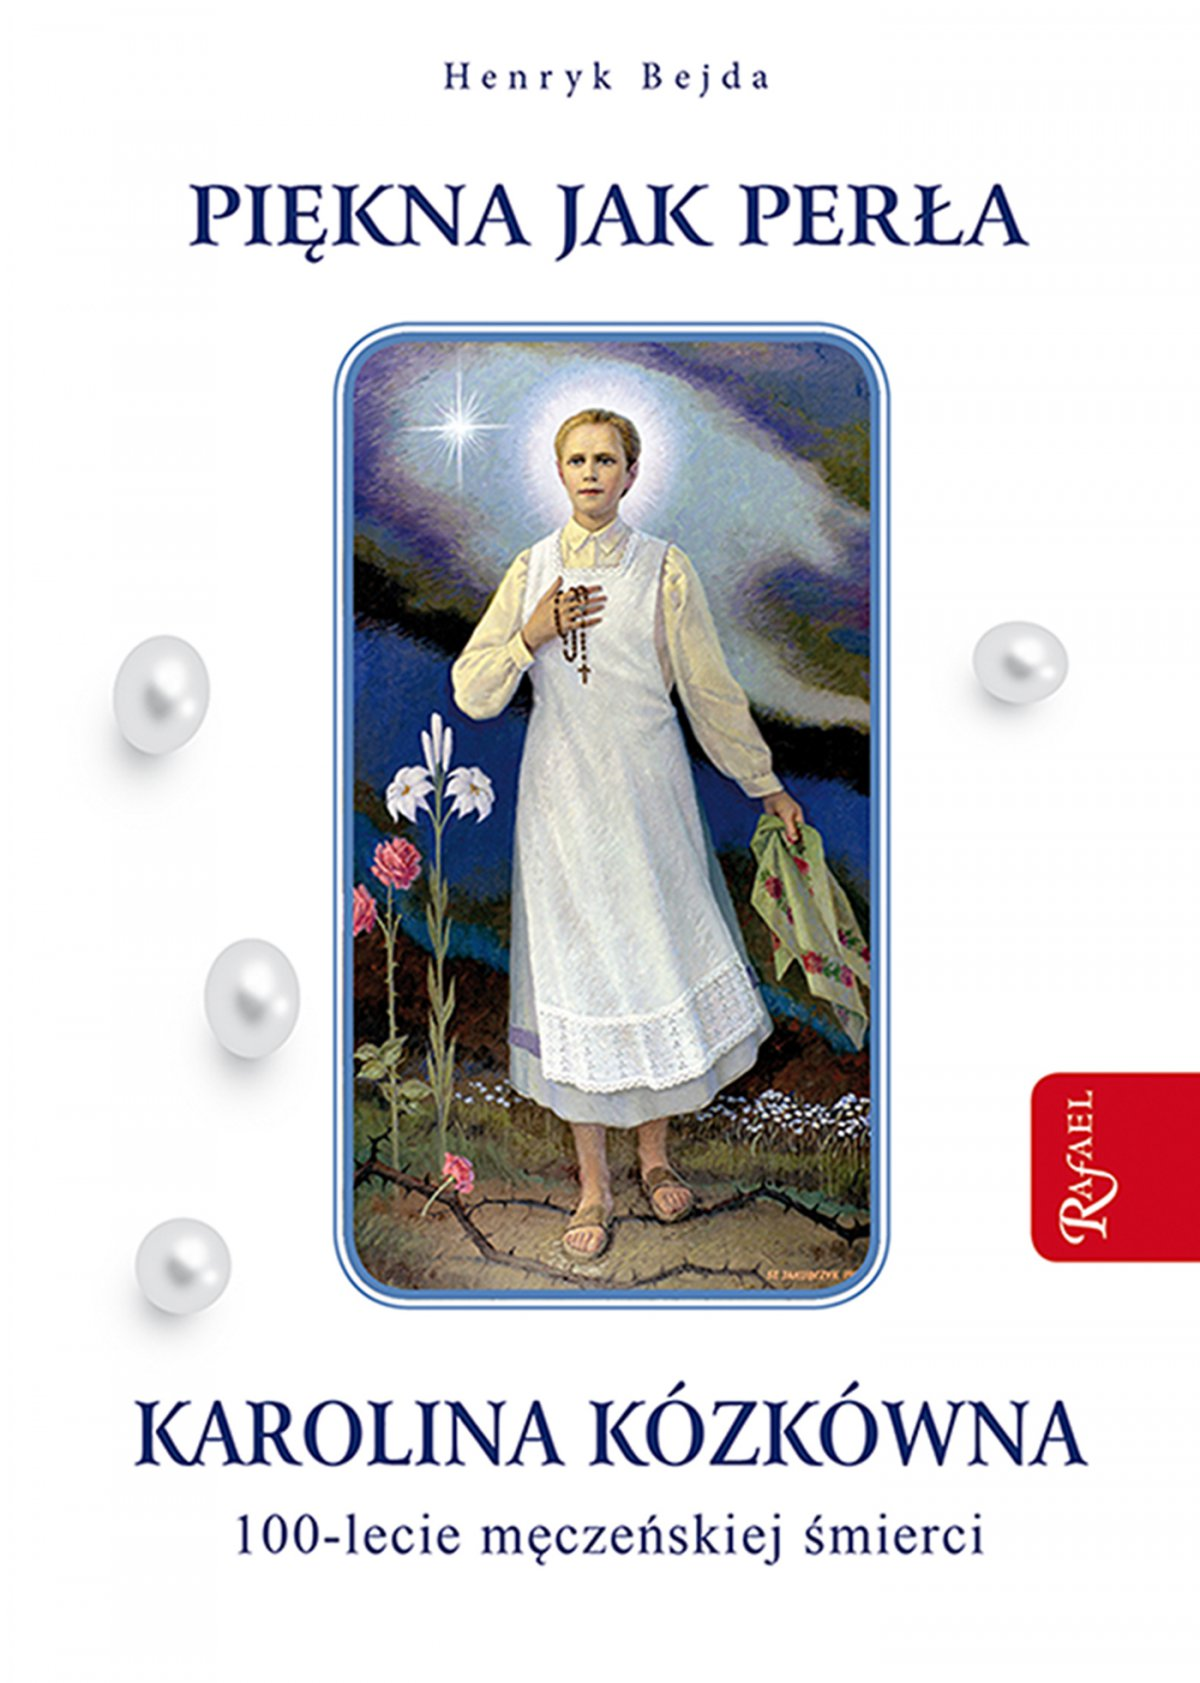 Piękna jak perła. Karolina Kózkówna - Ebook (Książka na Kindle) do pobrania w formacie MOBI